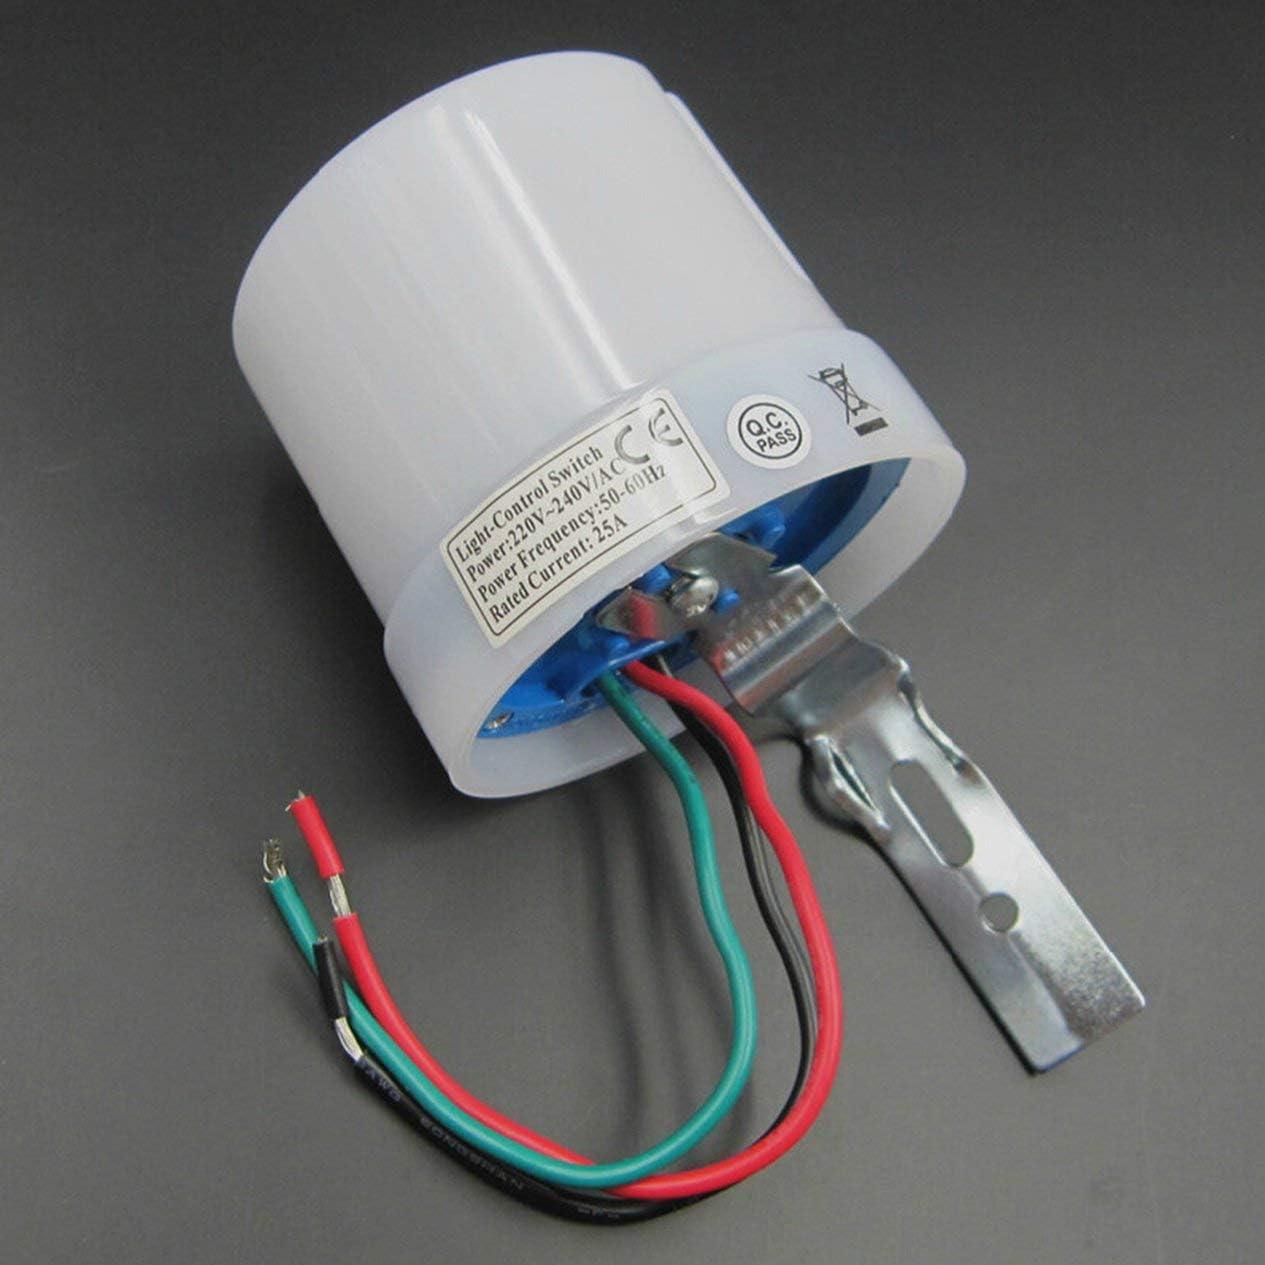 Light Control Switch Sensor Intelligent Switch Light Sense Adjustable Outdoor Waterproof and Dustproof High Power 25A